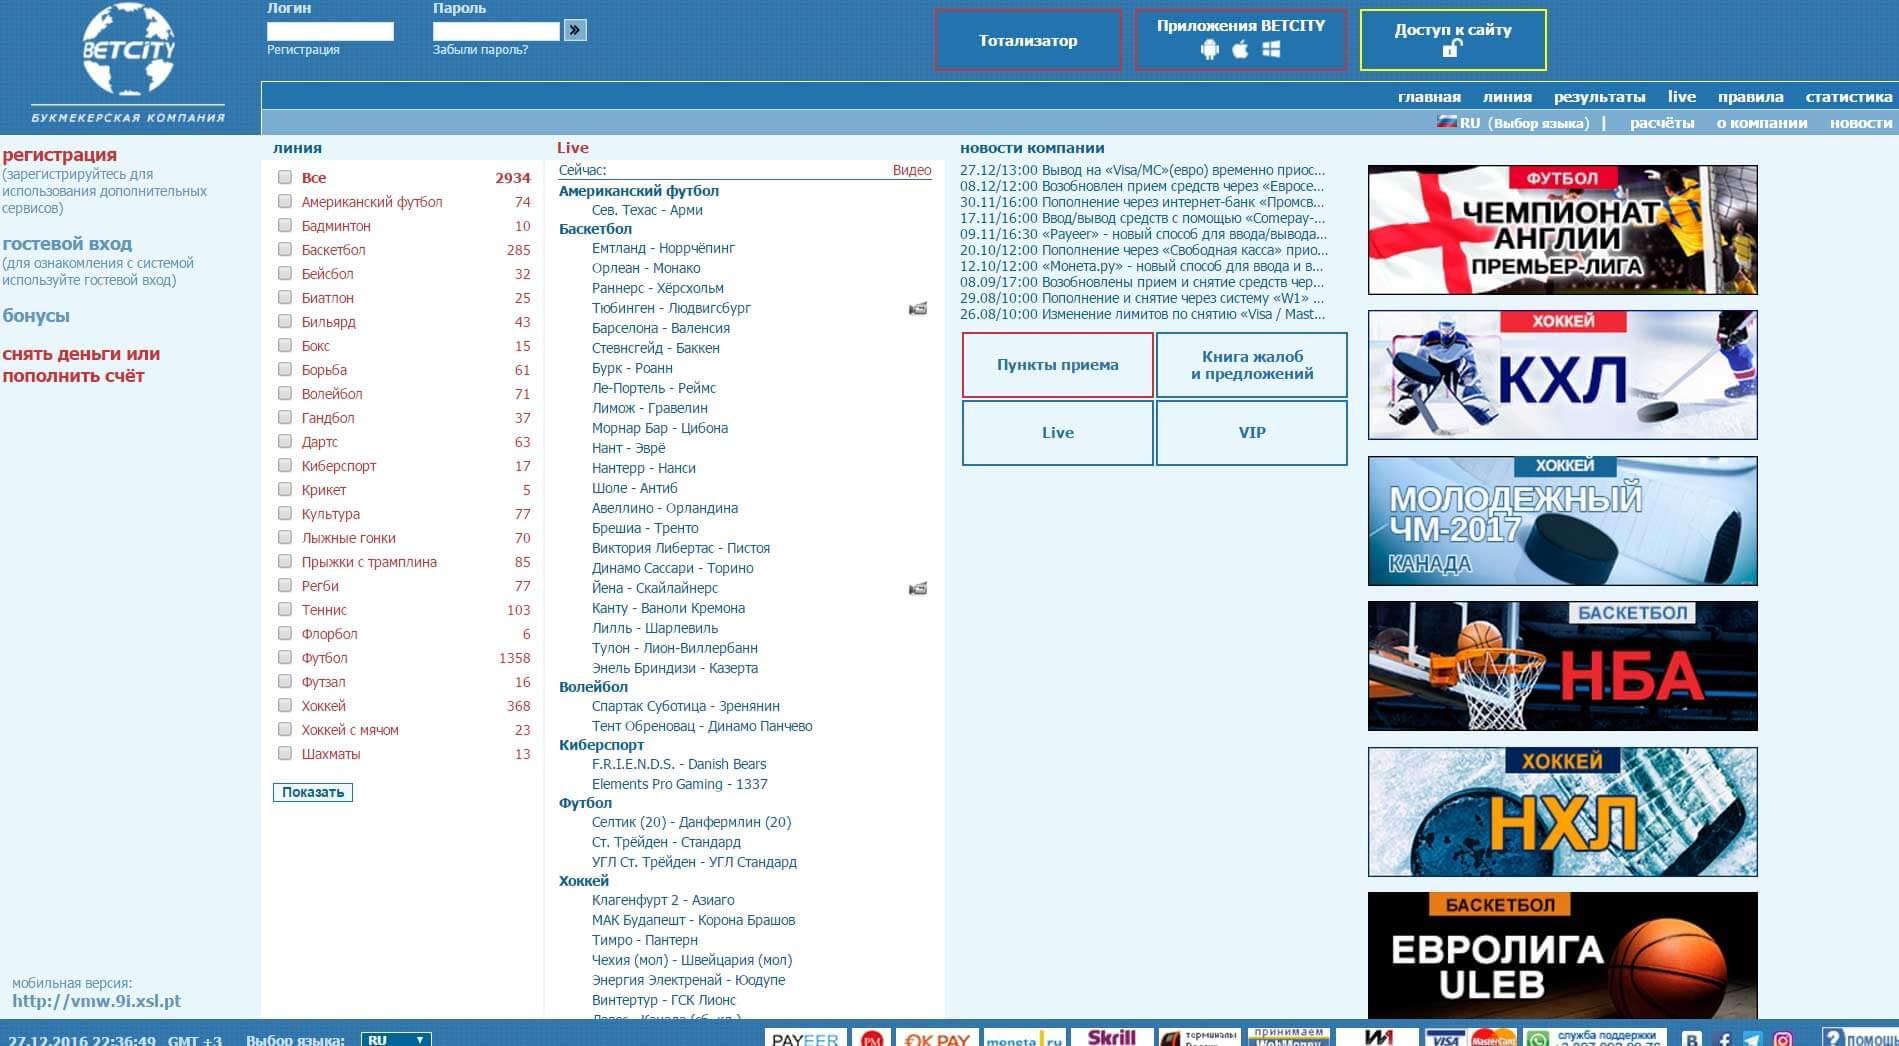 leon букмекерская контора ставки на киберспорт